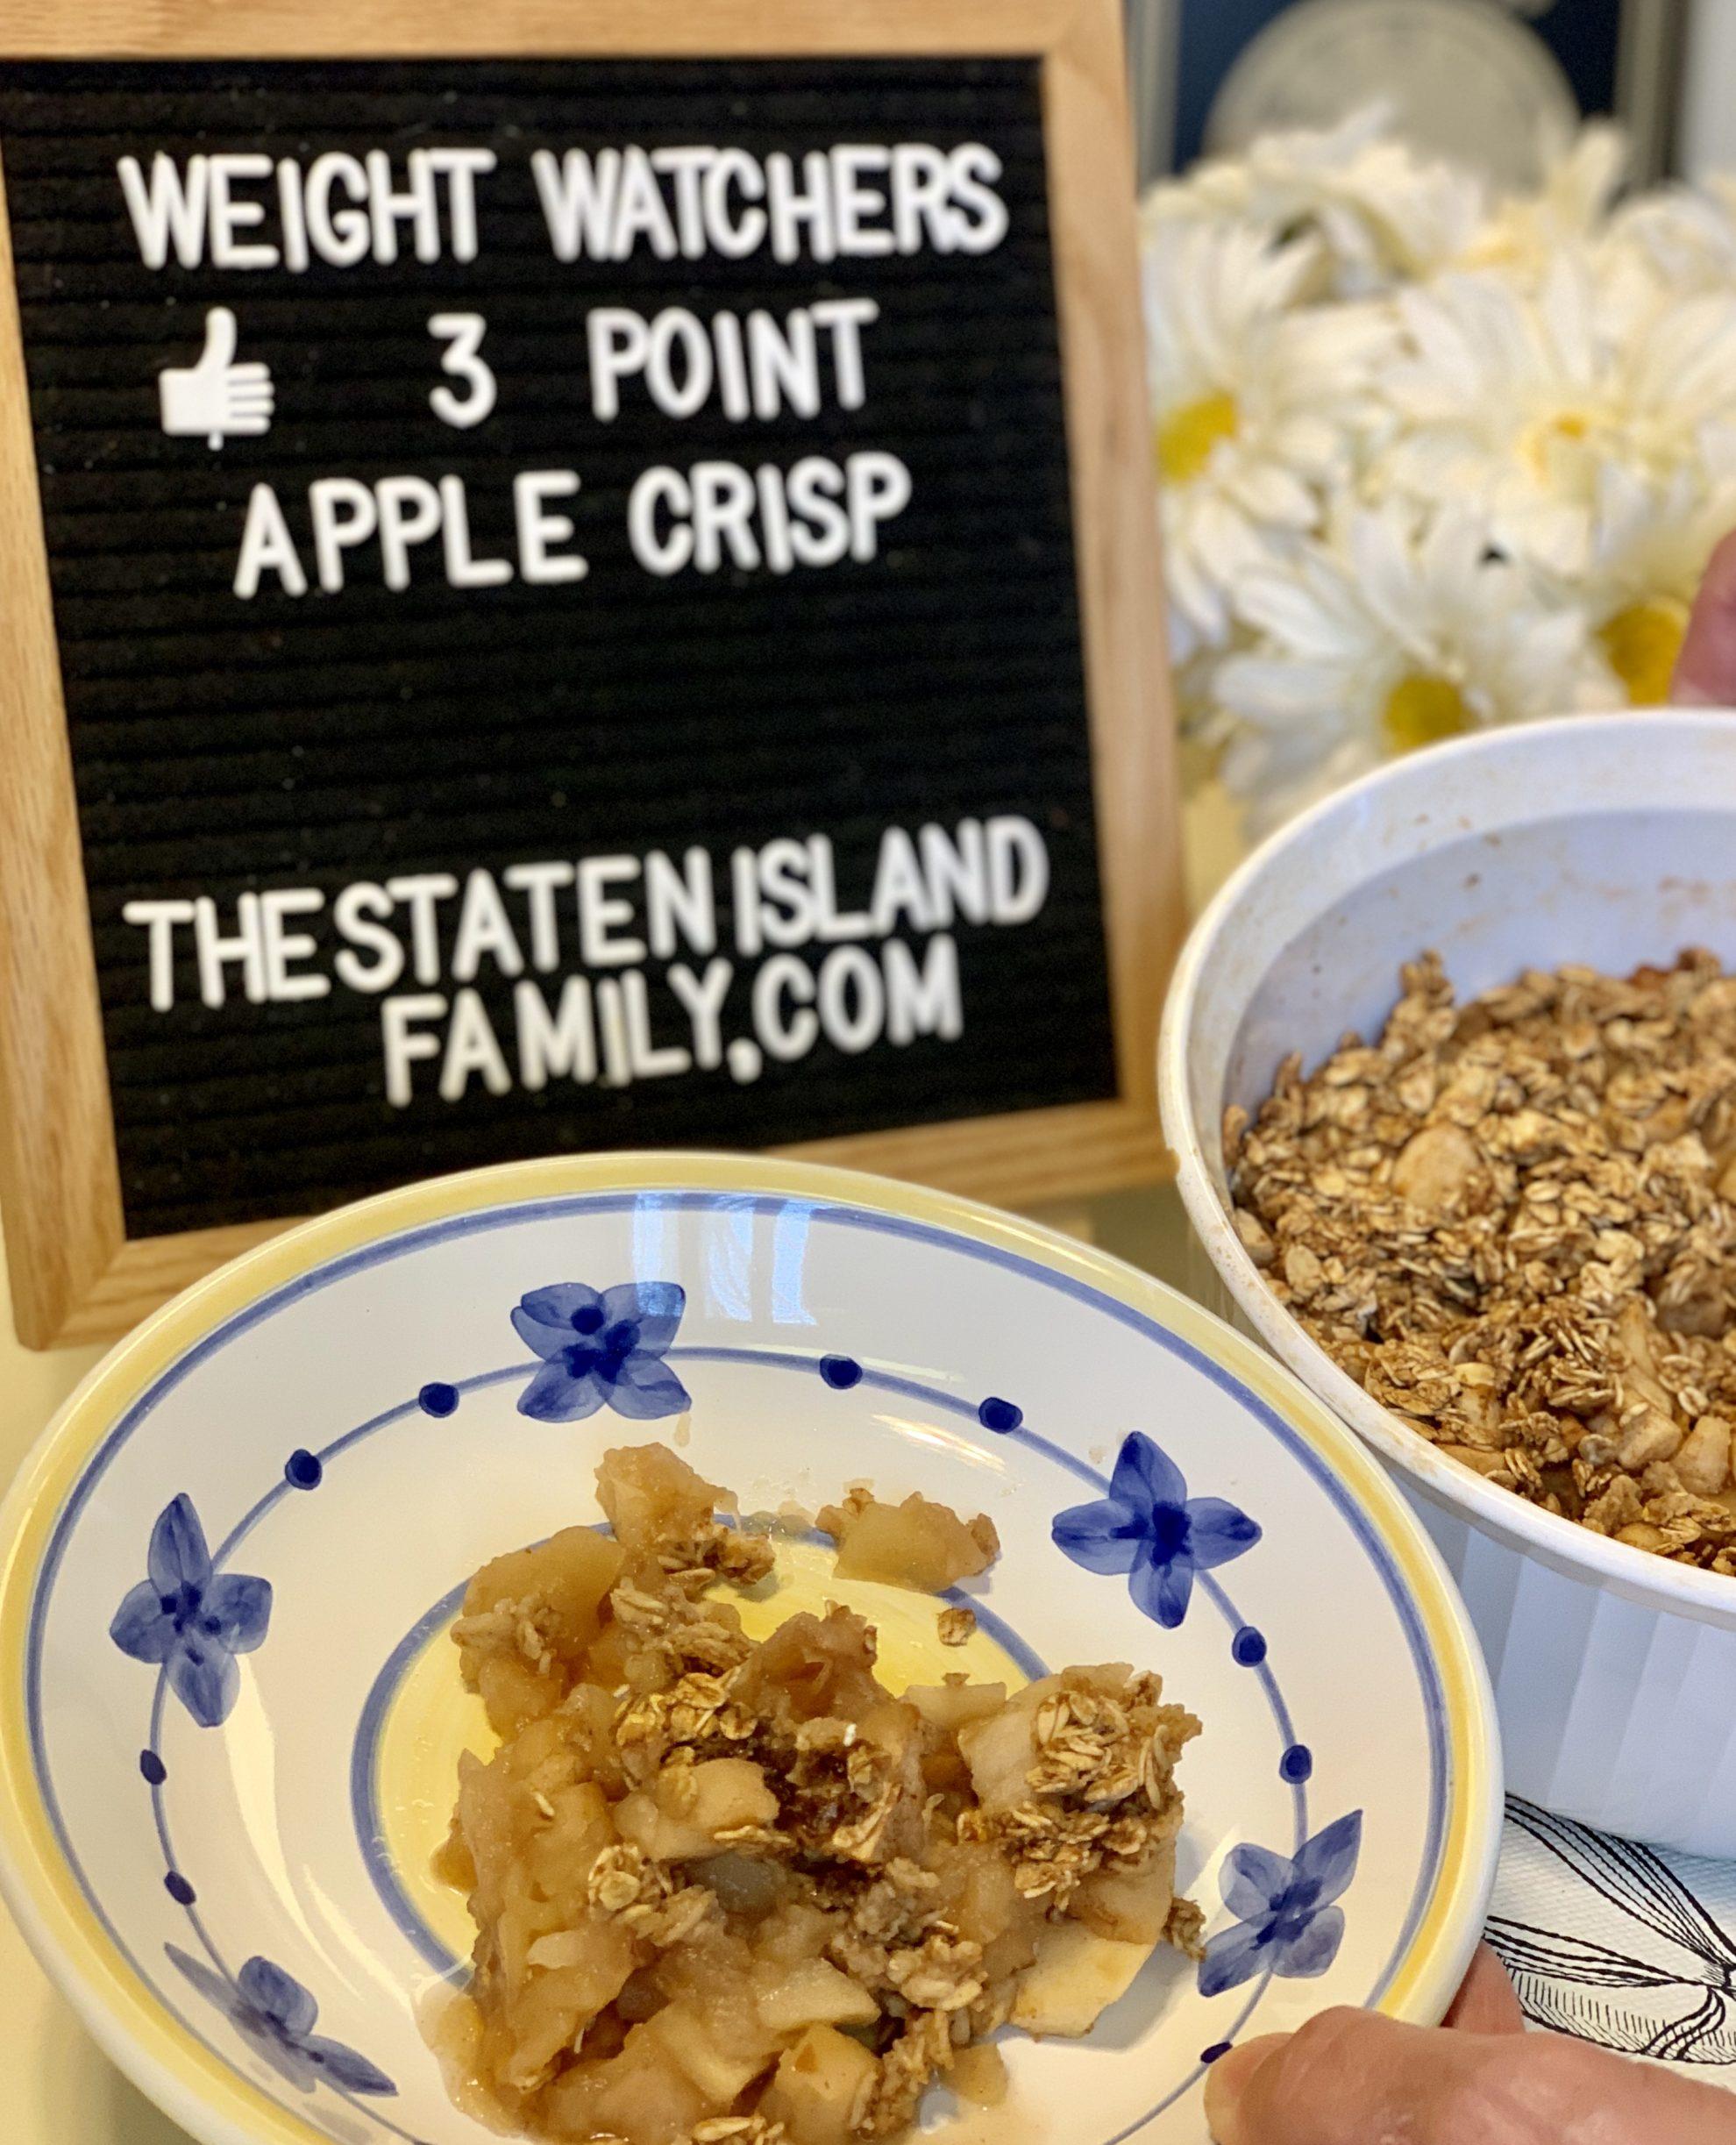 Weight Watchers Apple Crisp